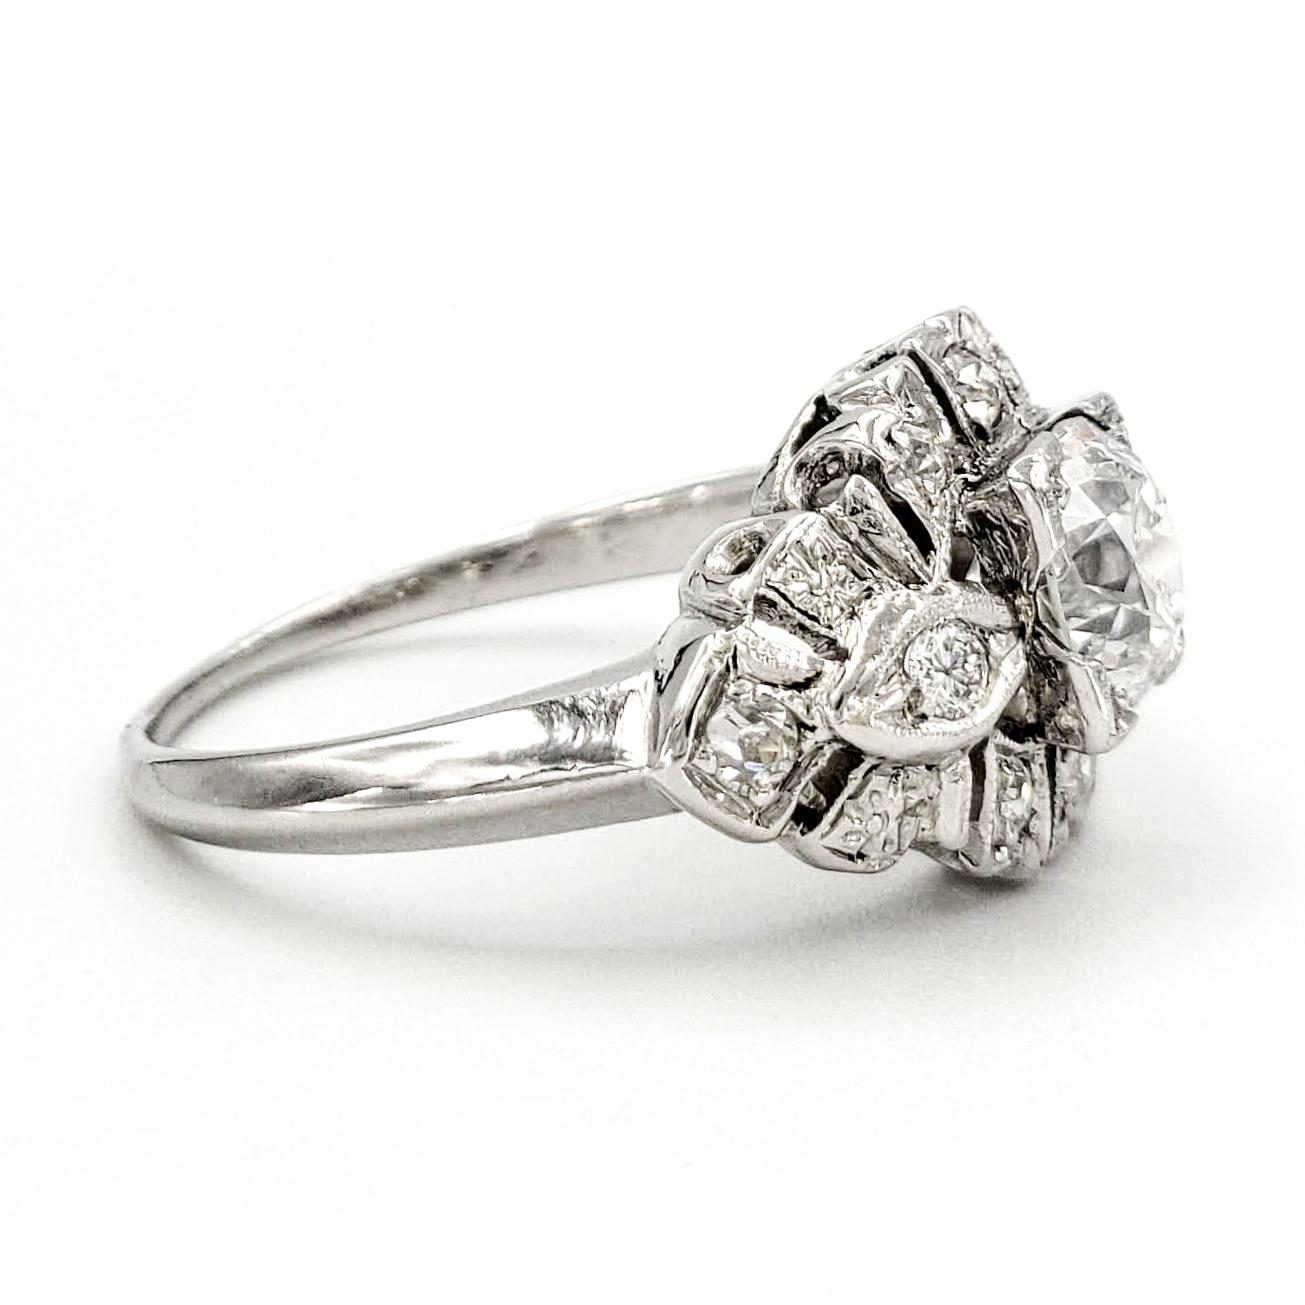 vintage-platinum-engagement-ring-with-0-82-carat-old-european-cut-diamond-egl-f-si1